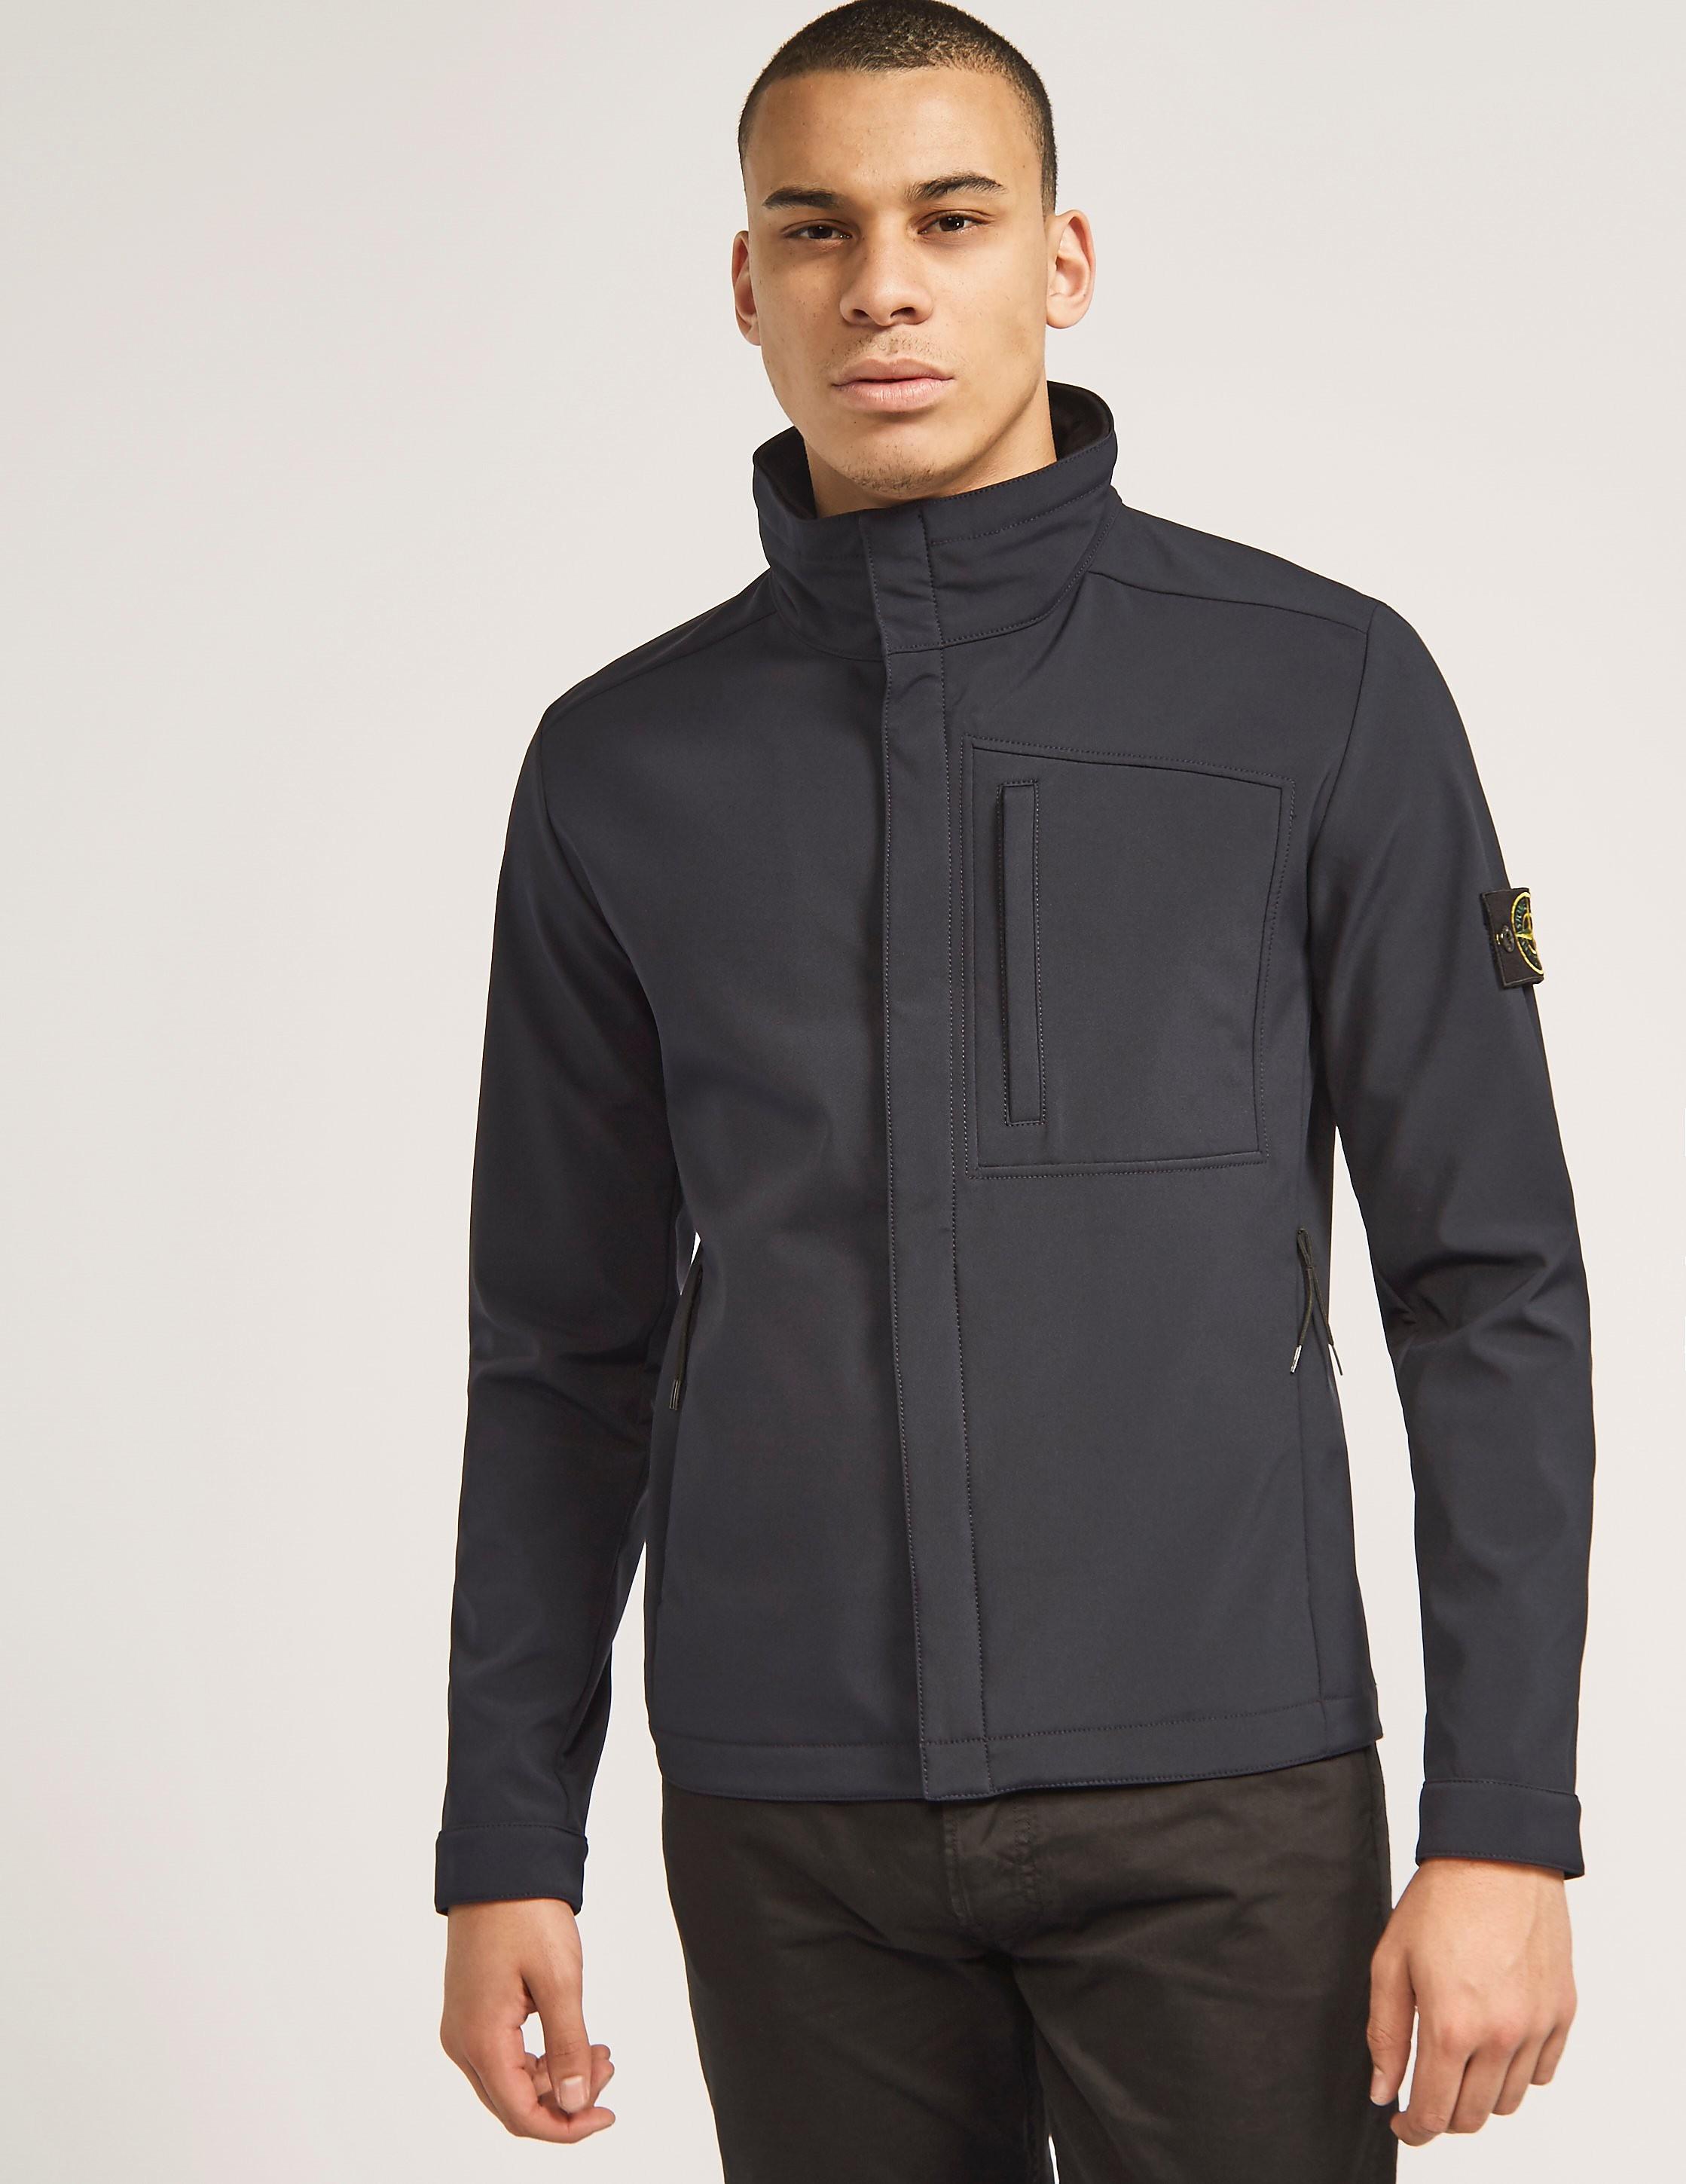 Stone Island Softer CL Jacket